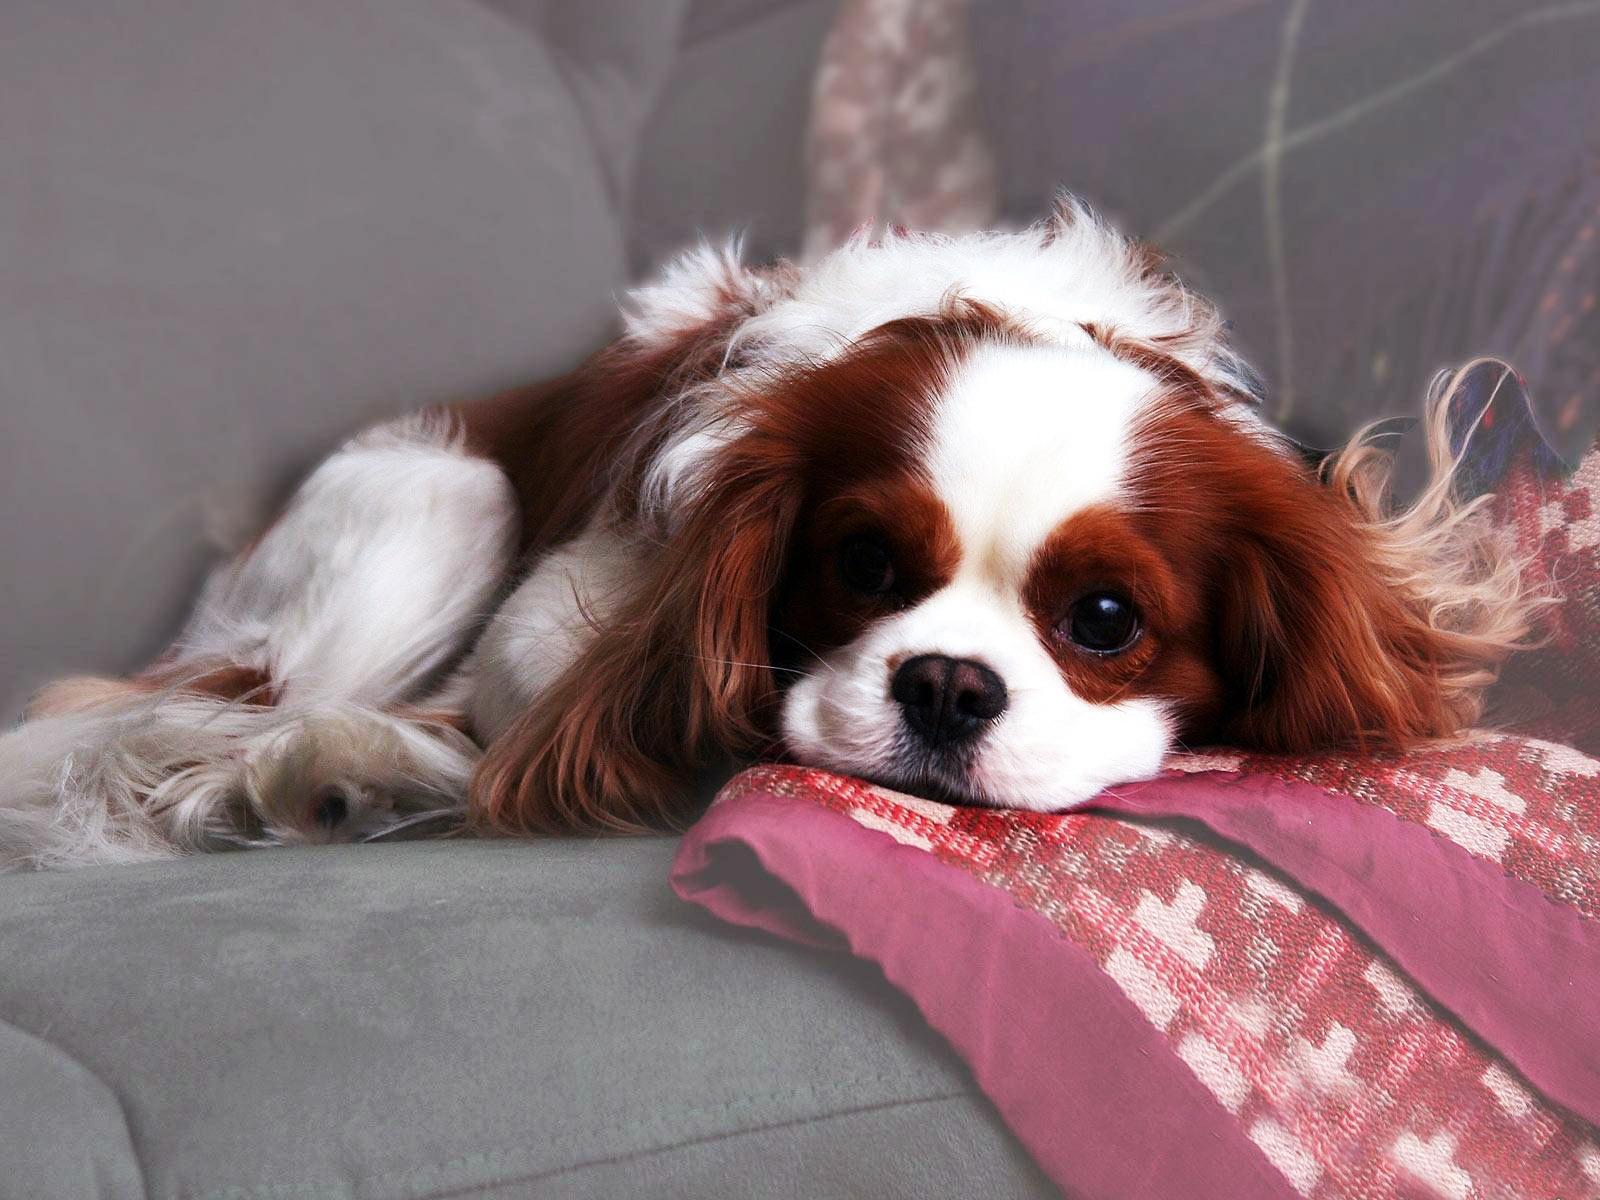 http://4.bp.blogspot.com/-MoA5zY3rmiw/T18P5ueoHLI/AAAAAAAAZxg/4OP3ihl2IgI/s1600/Dogs+(52).jpg